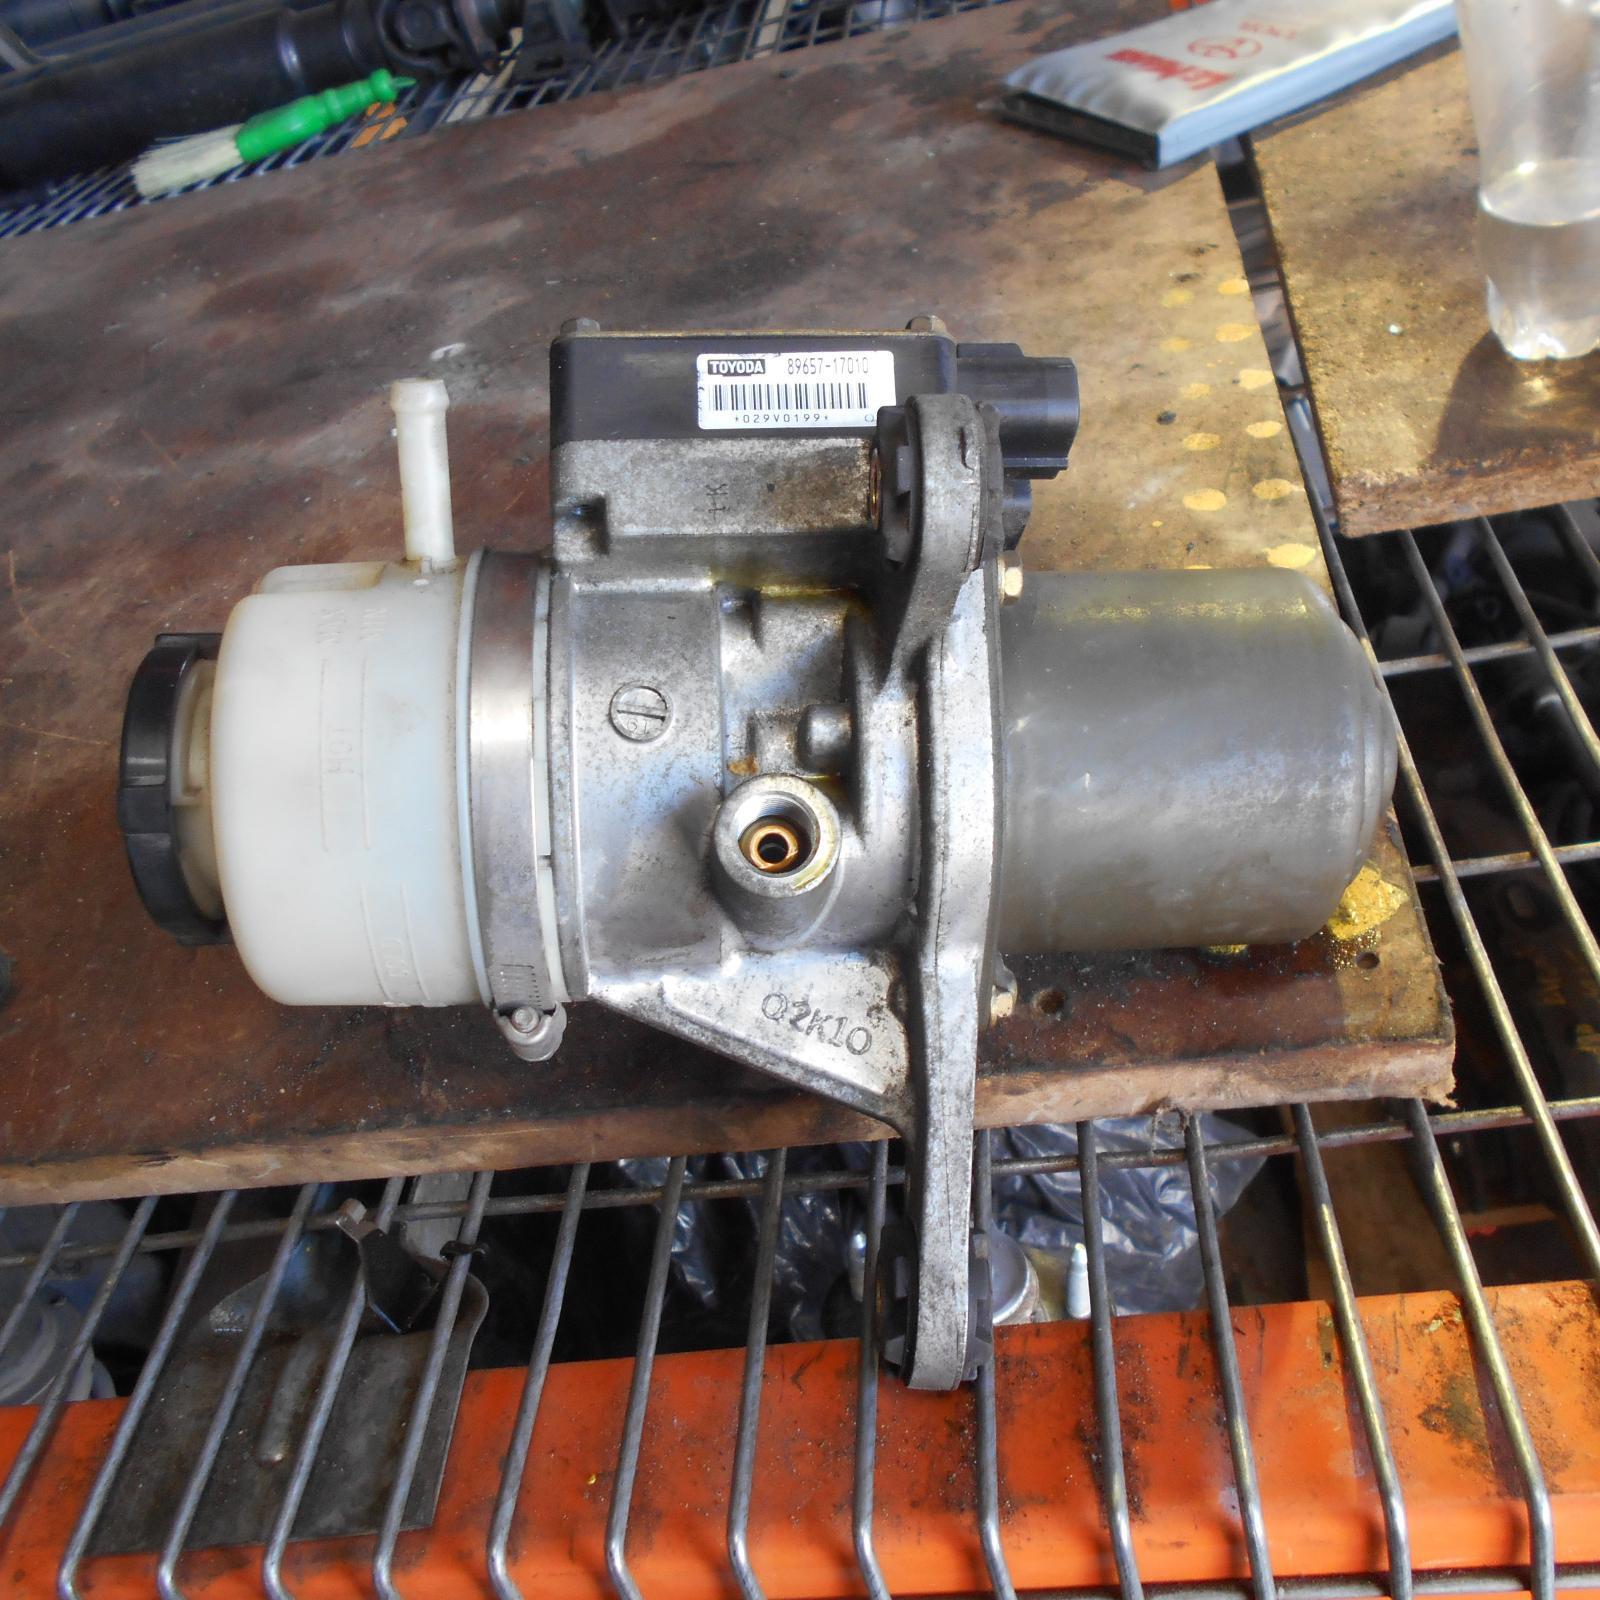 TOYOTA MR2, Power Steering Fluid, 30 SERIES 10/00-10/05